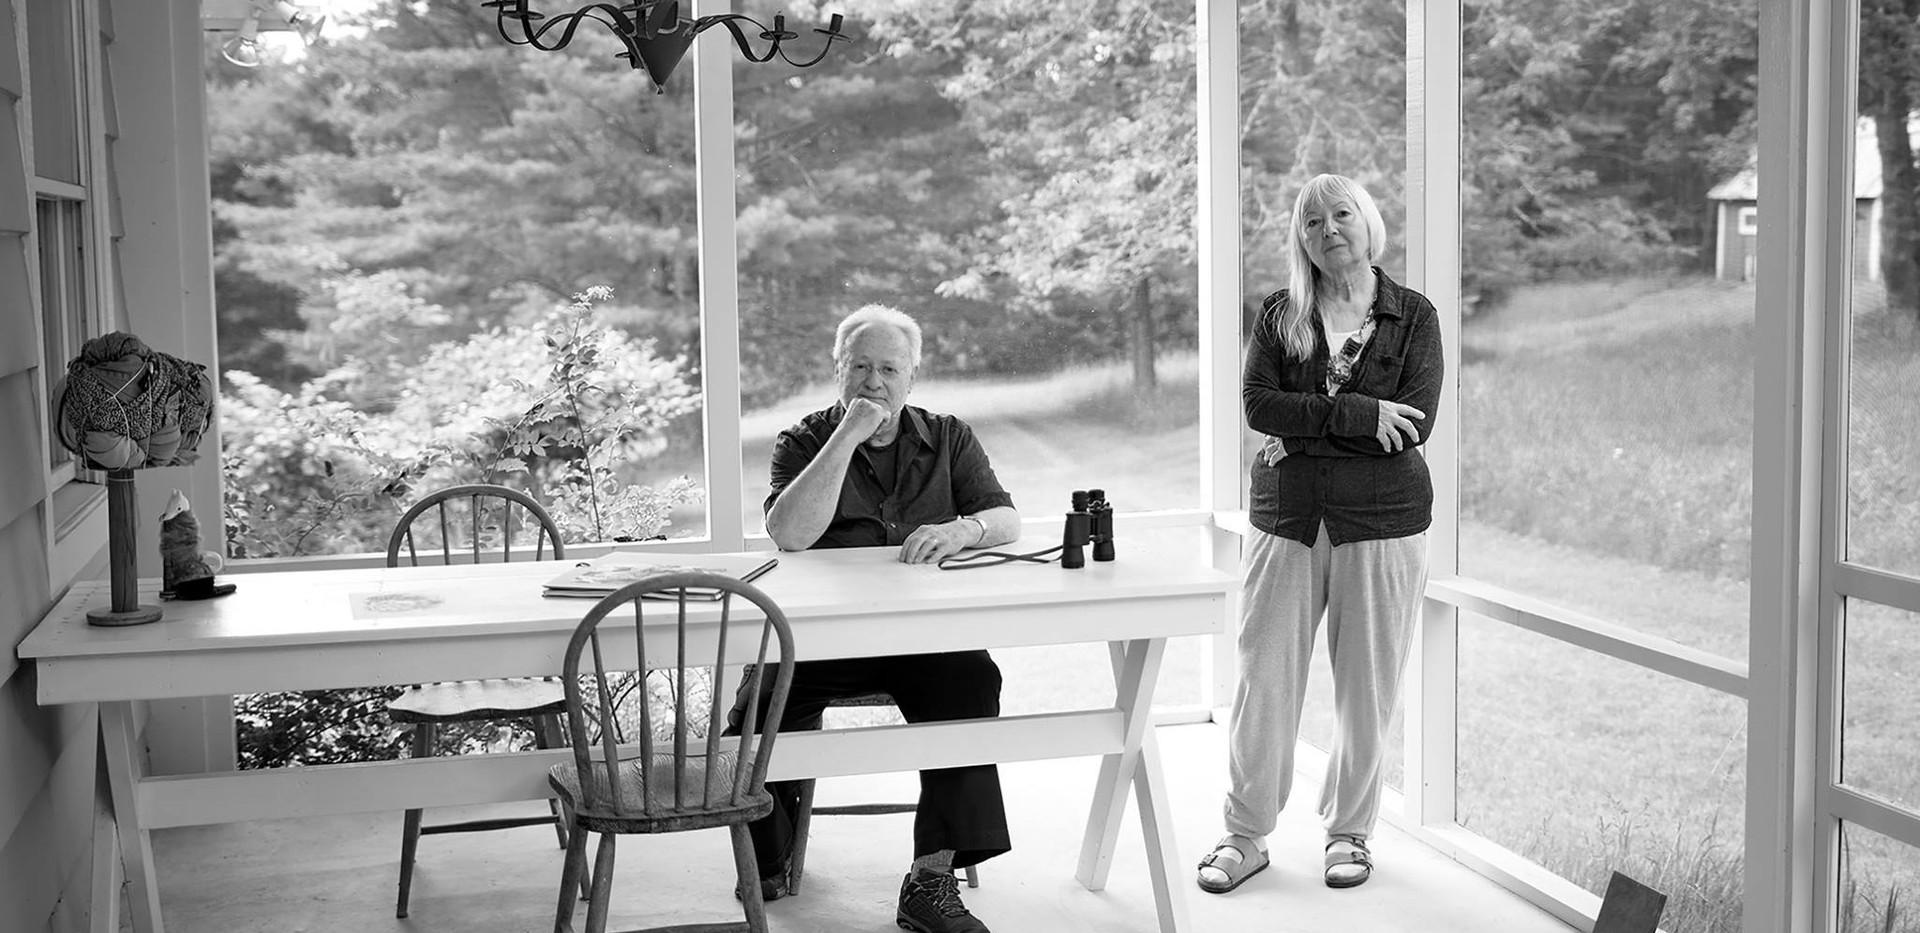 Artists John Tomlinson & Daria Dorosh on studio porch 2017